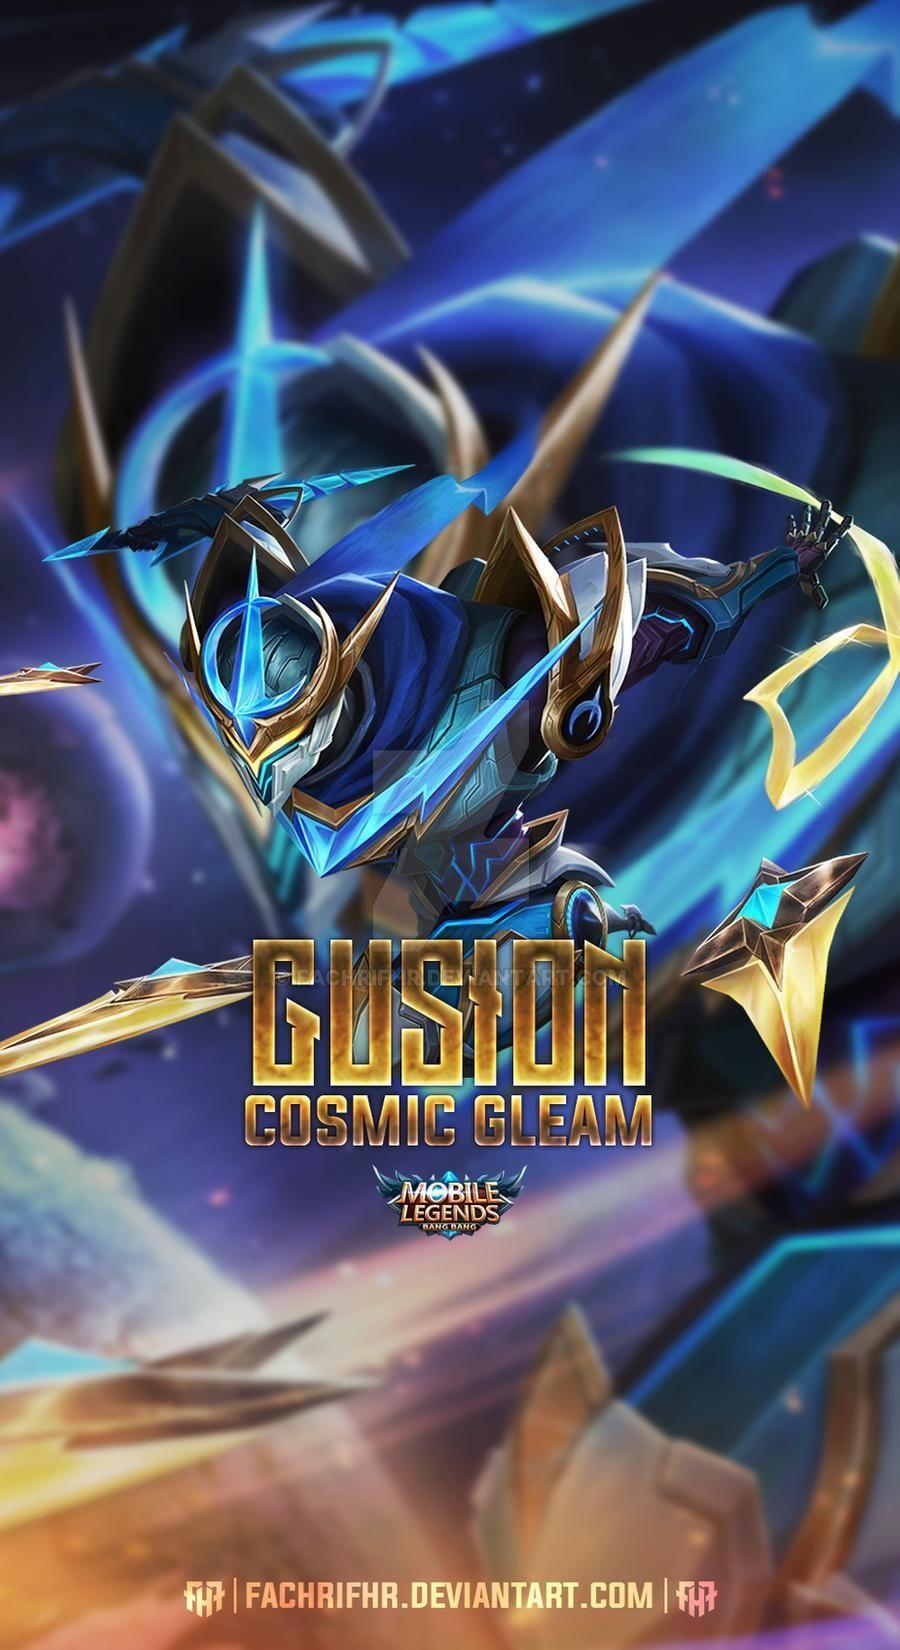 Gusion Cosmic Gleam by FachriFHR on DeviantArt in 2020 ...